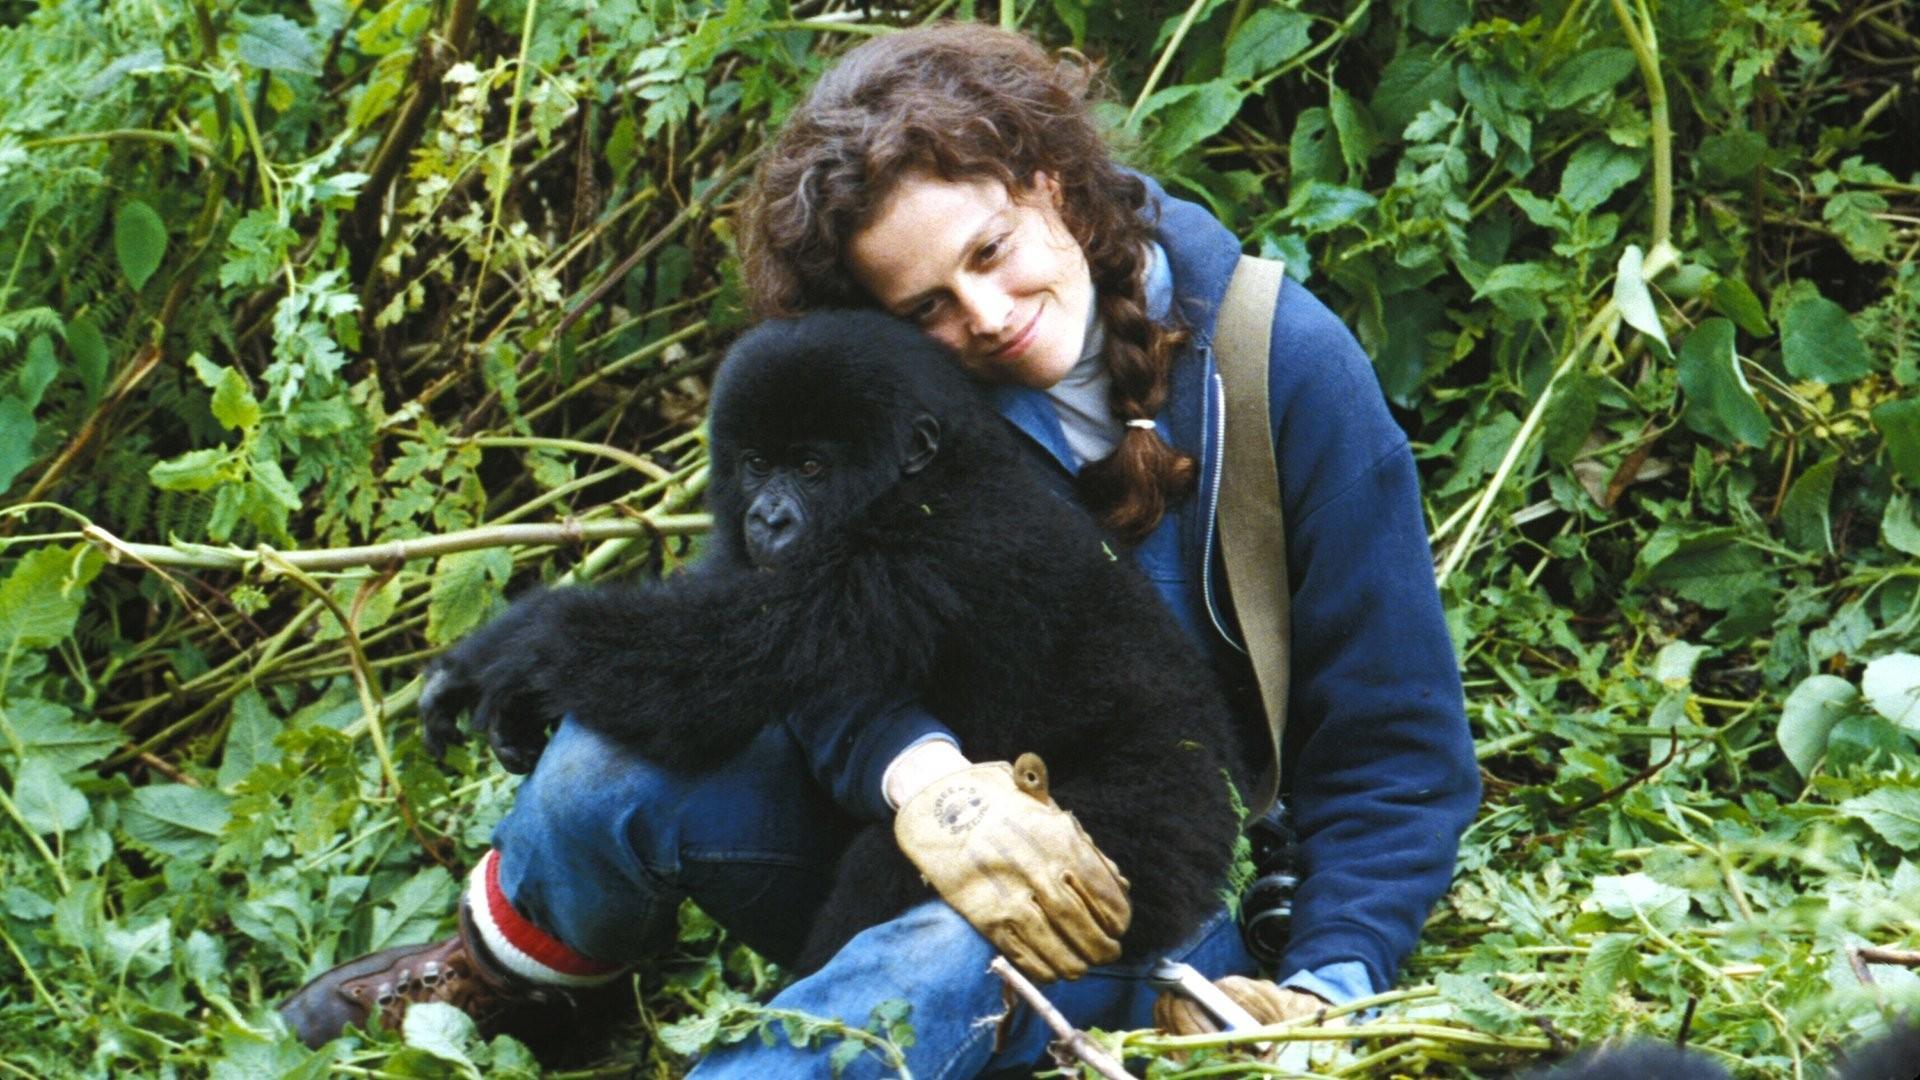 Films-gorillas-in-the-mist